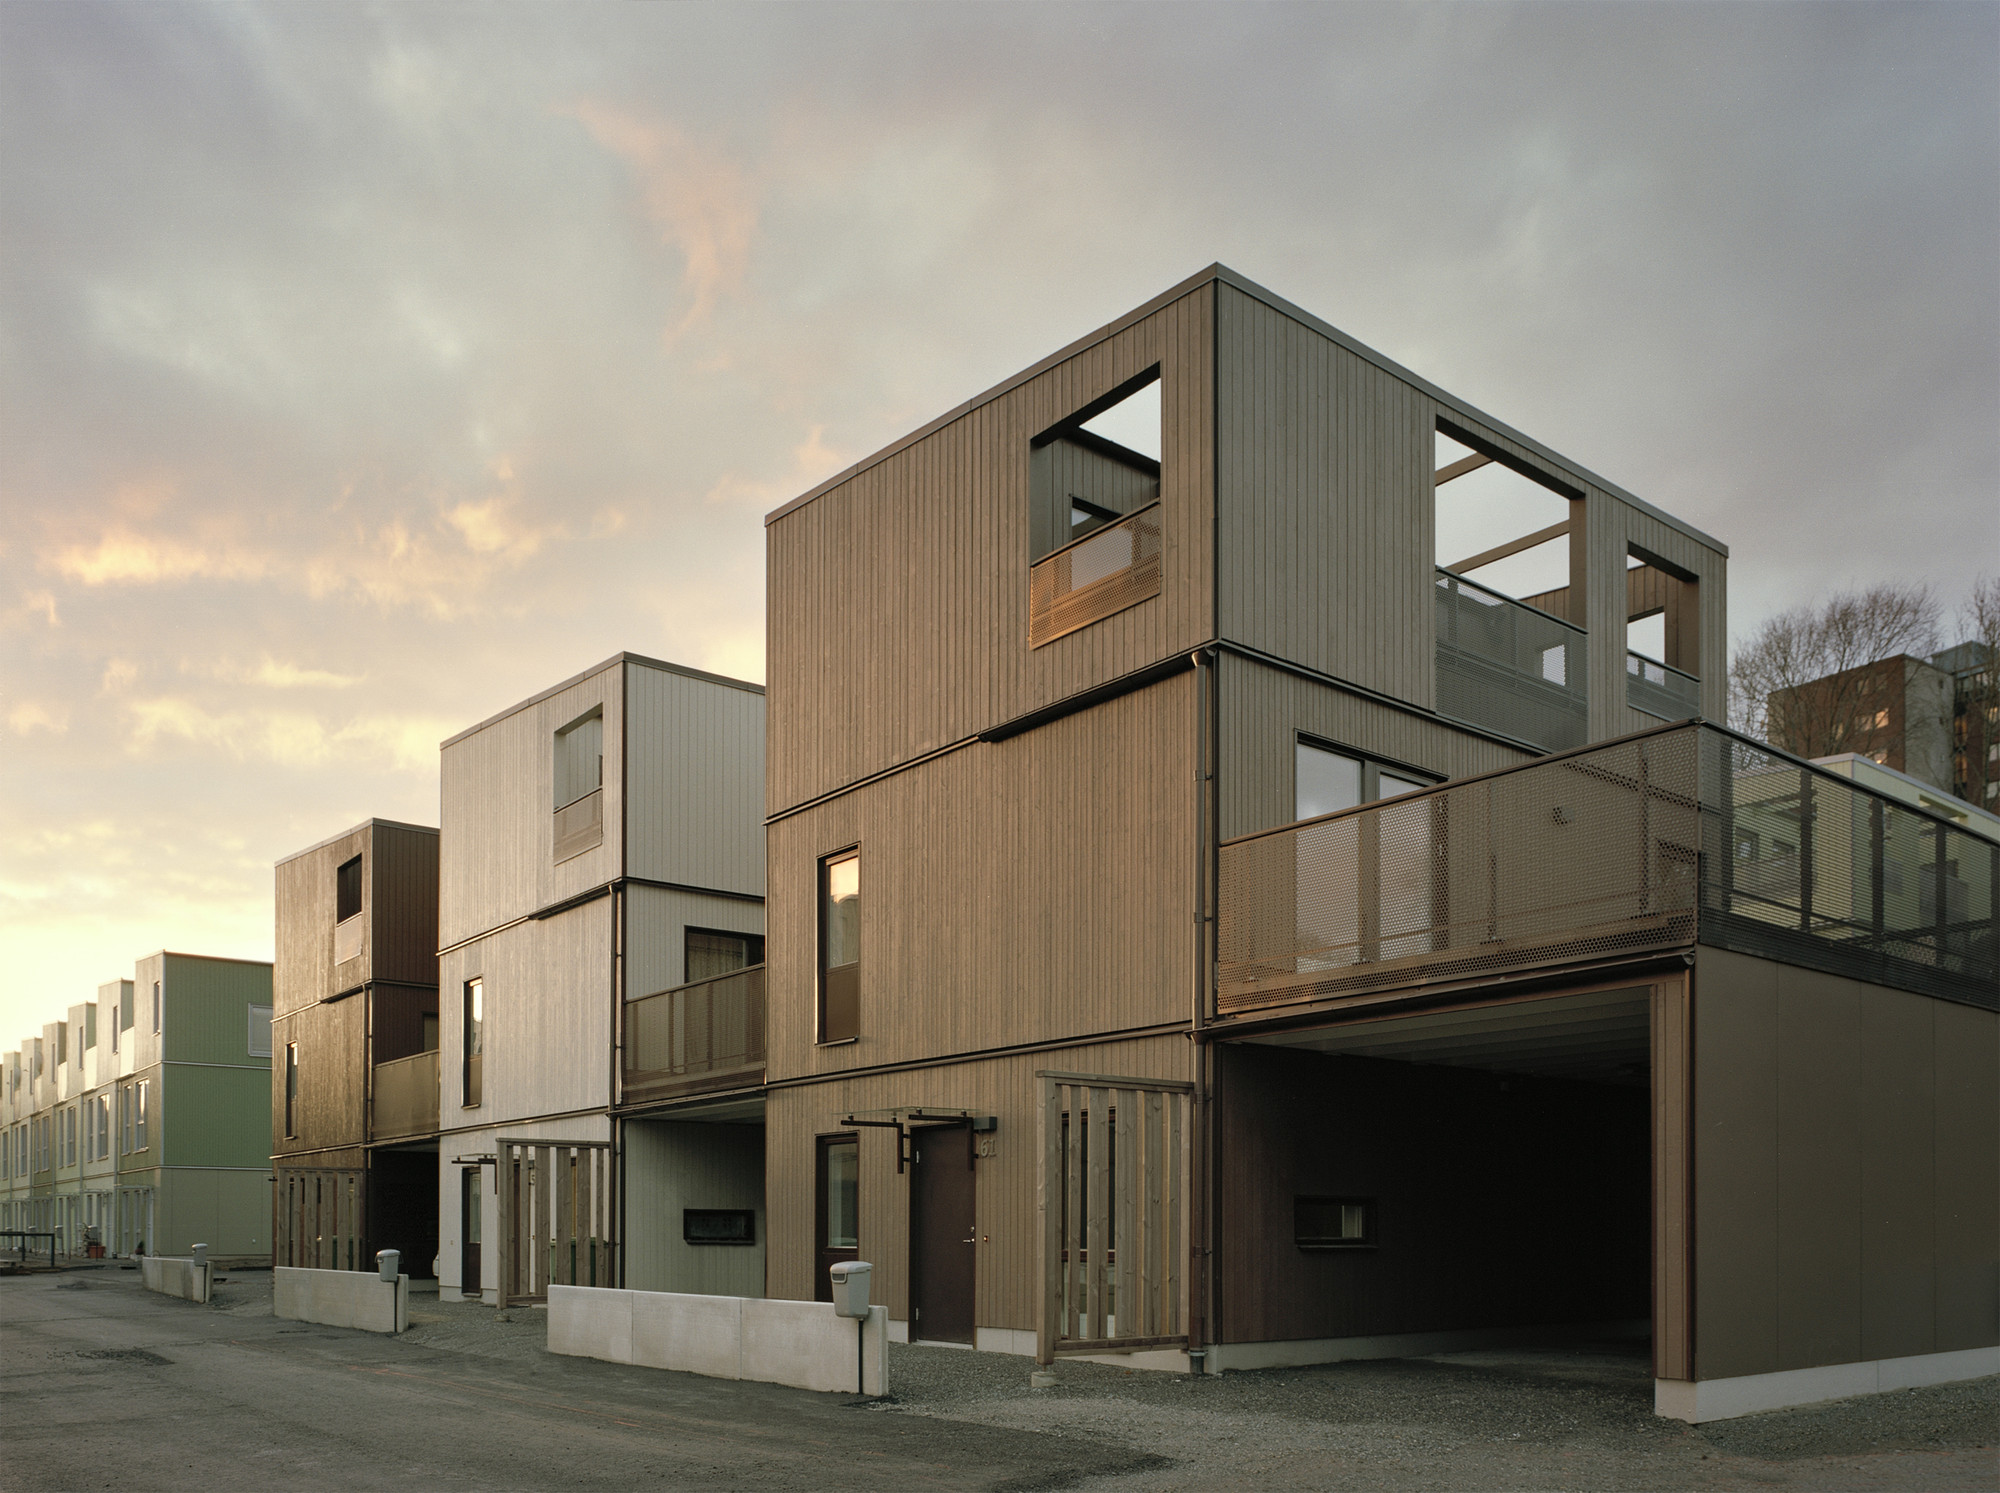 Fittja Terraces / Kjellander + Sjöberg Architects , © Johan Fowelin